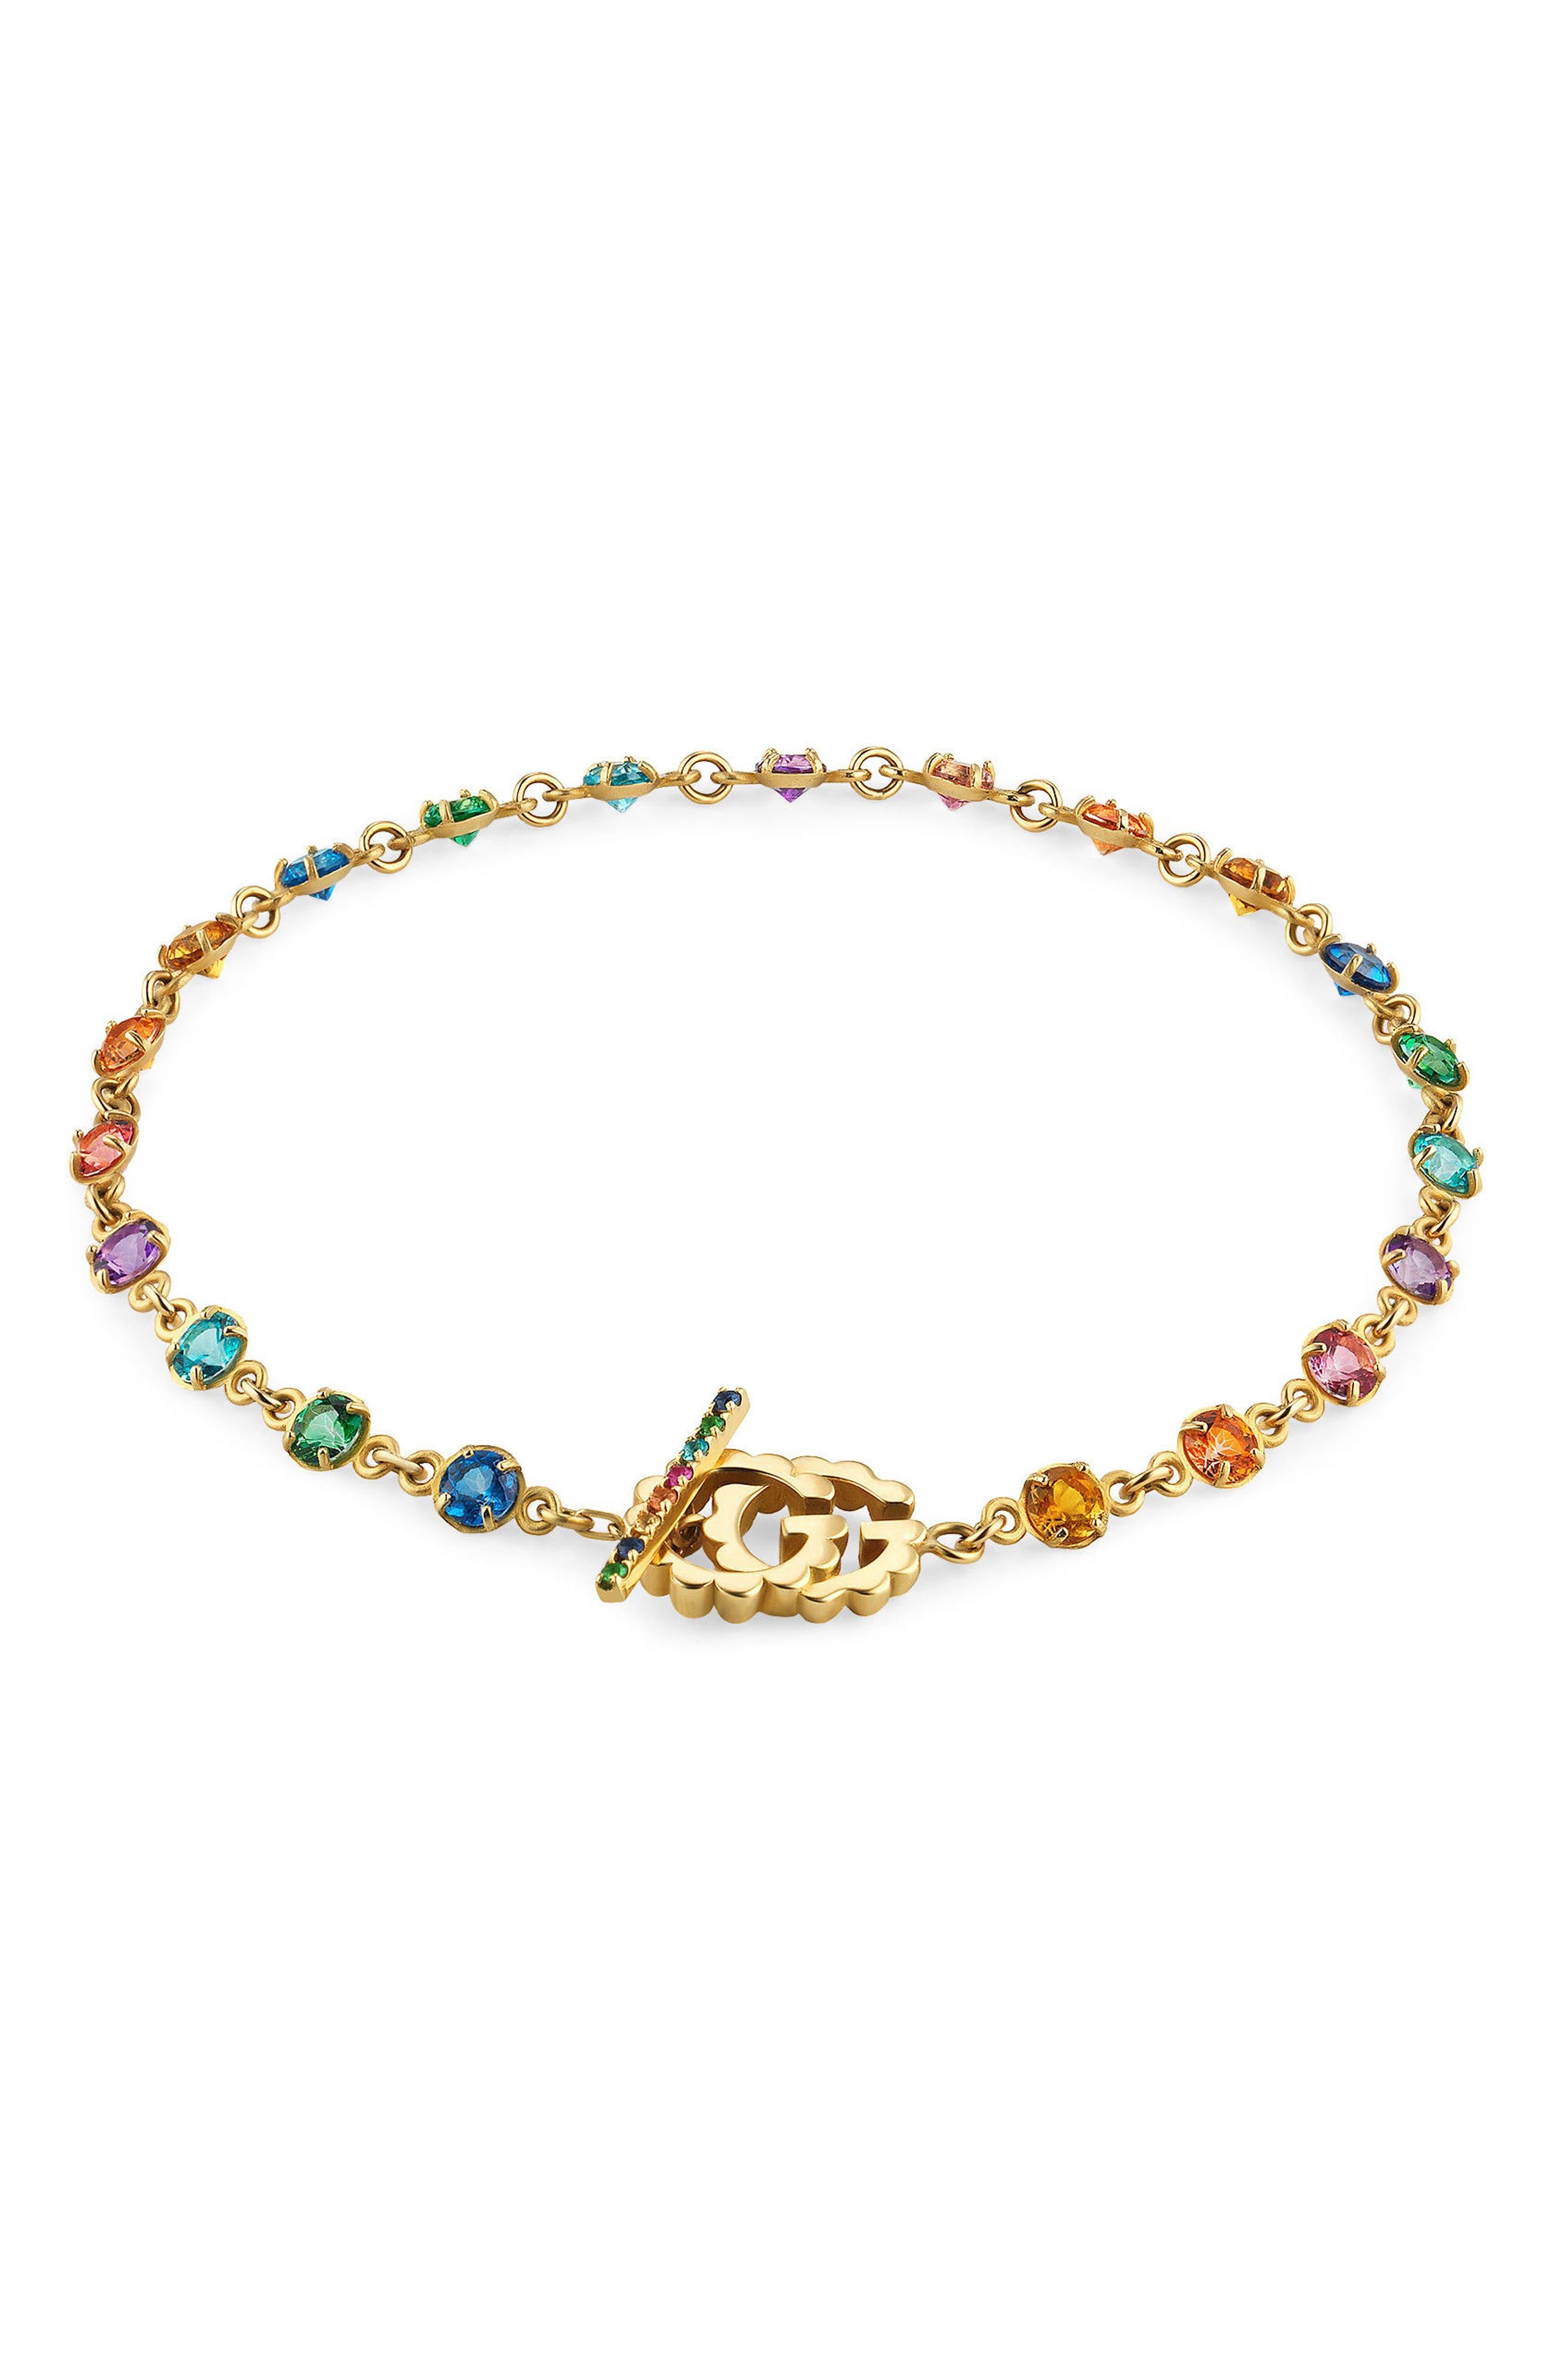 Main Image - Gucci Running G Semiprecious Stone Linear Bracelet